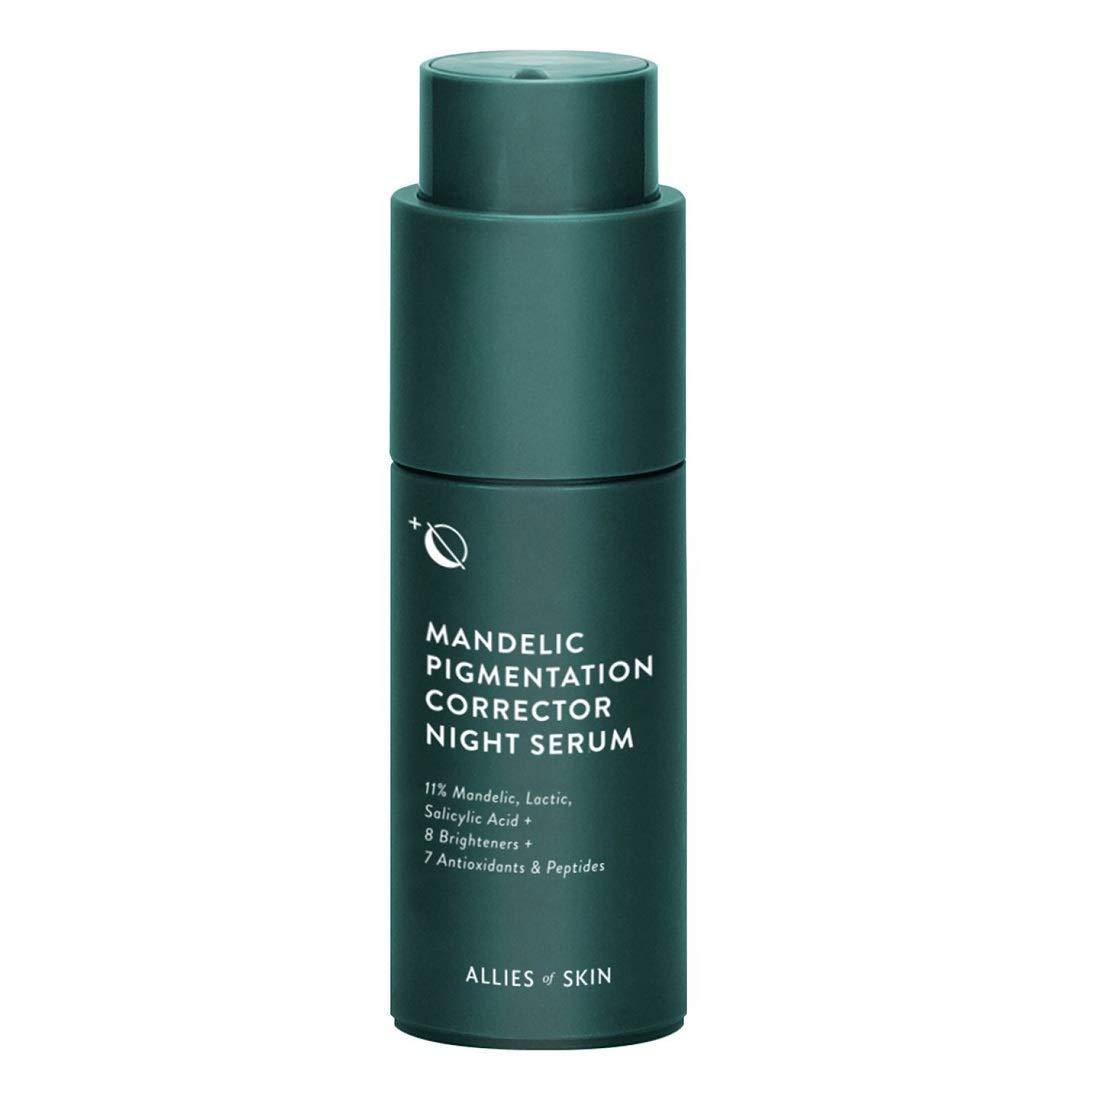 ALLIES OF SKIN Mandelic Pigmentation Corrector Night Serum 30ml B07MDX6Y2W